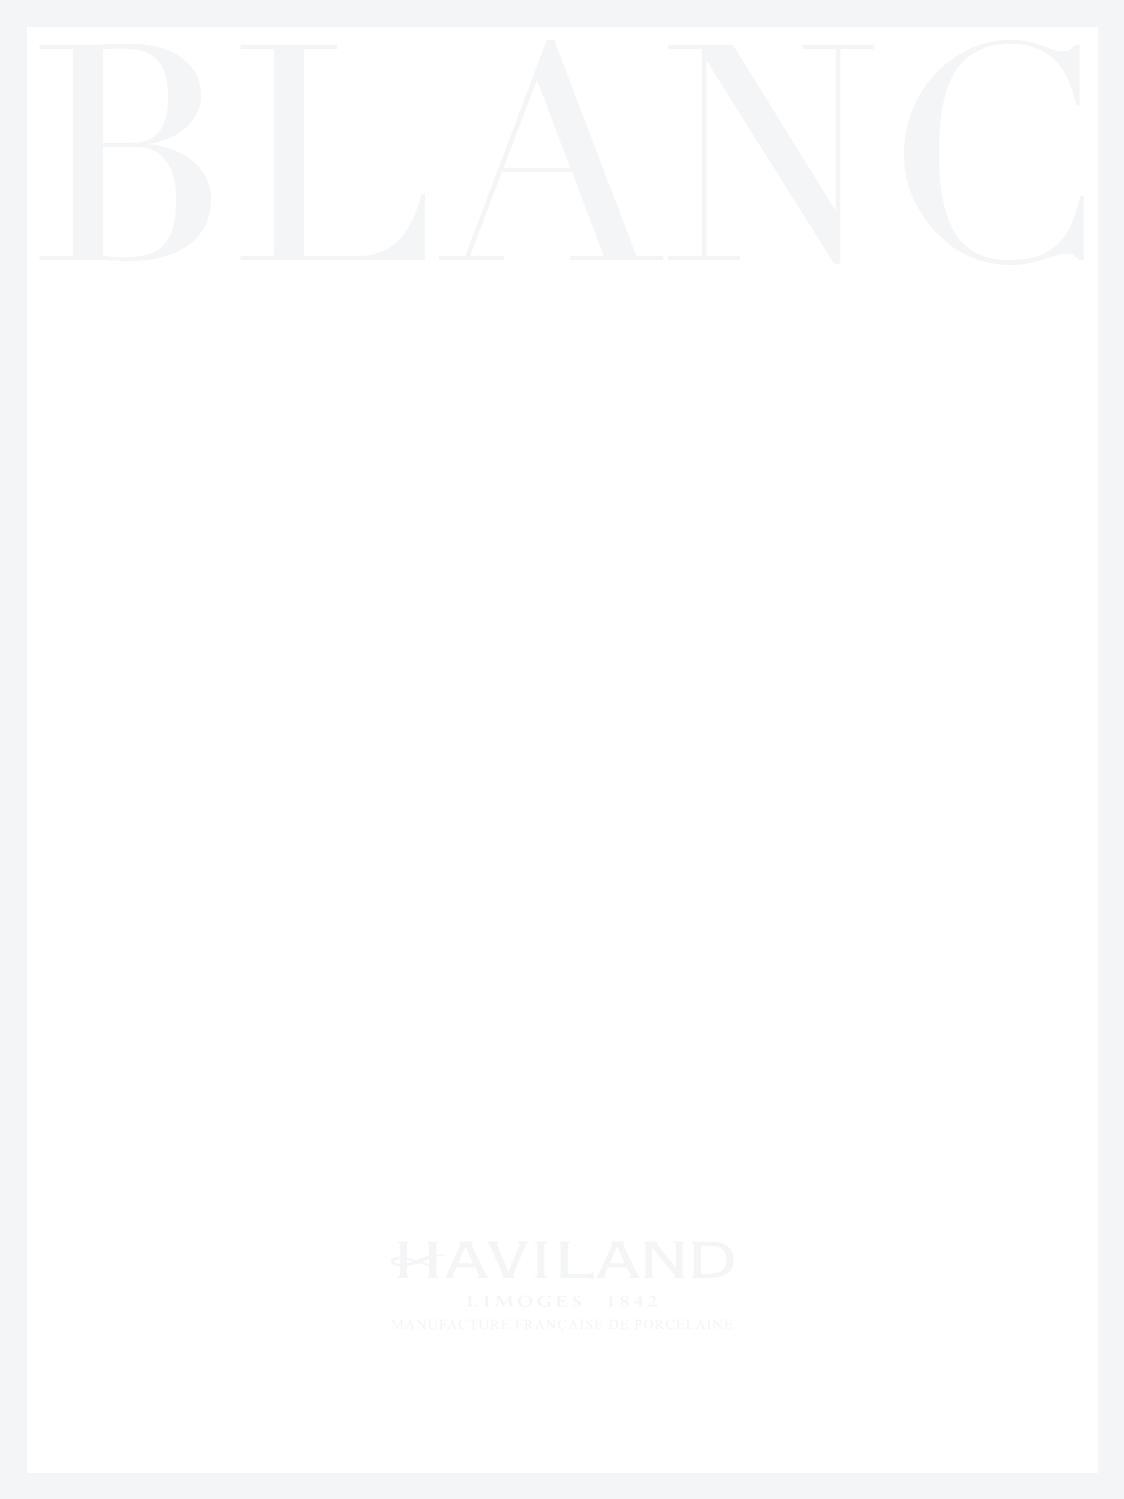 d59bfd20ee39f7 Catalogue blanc haviland by Daum-Haviland, Inc. - issuu